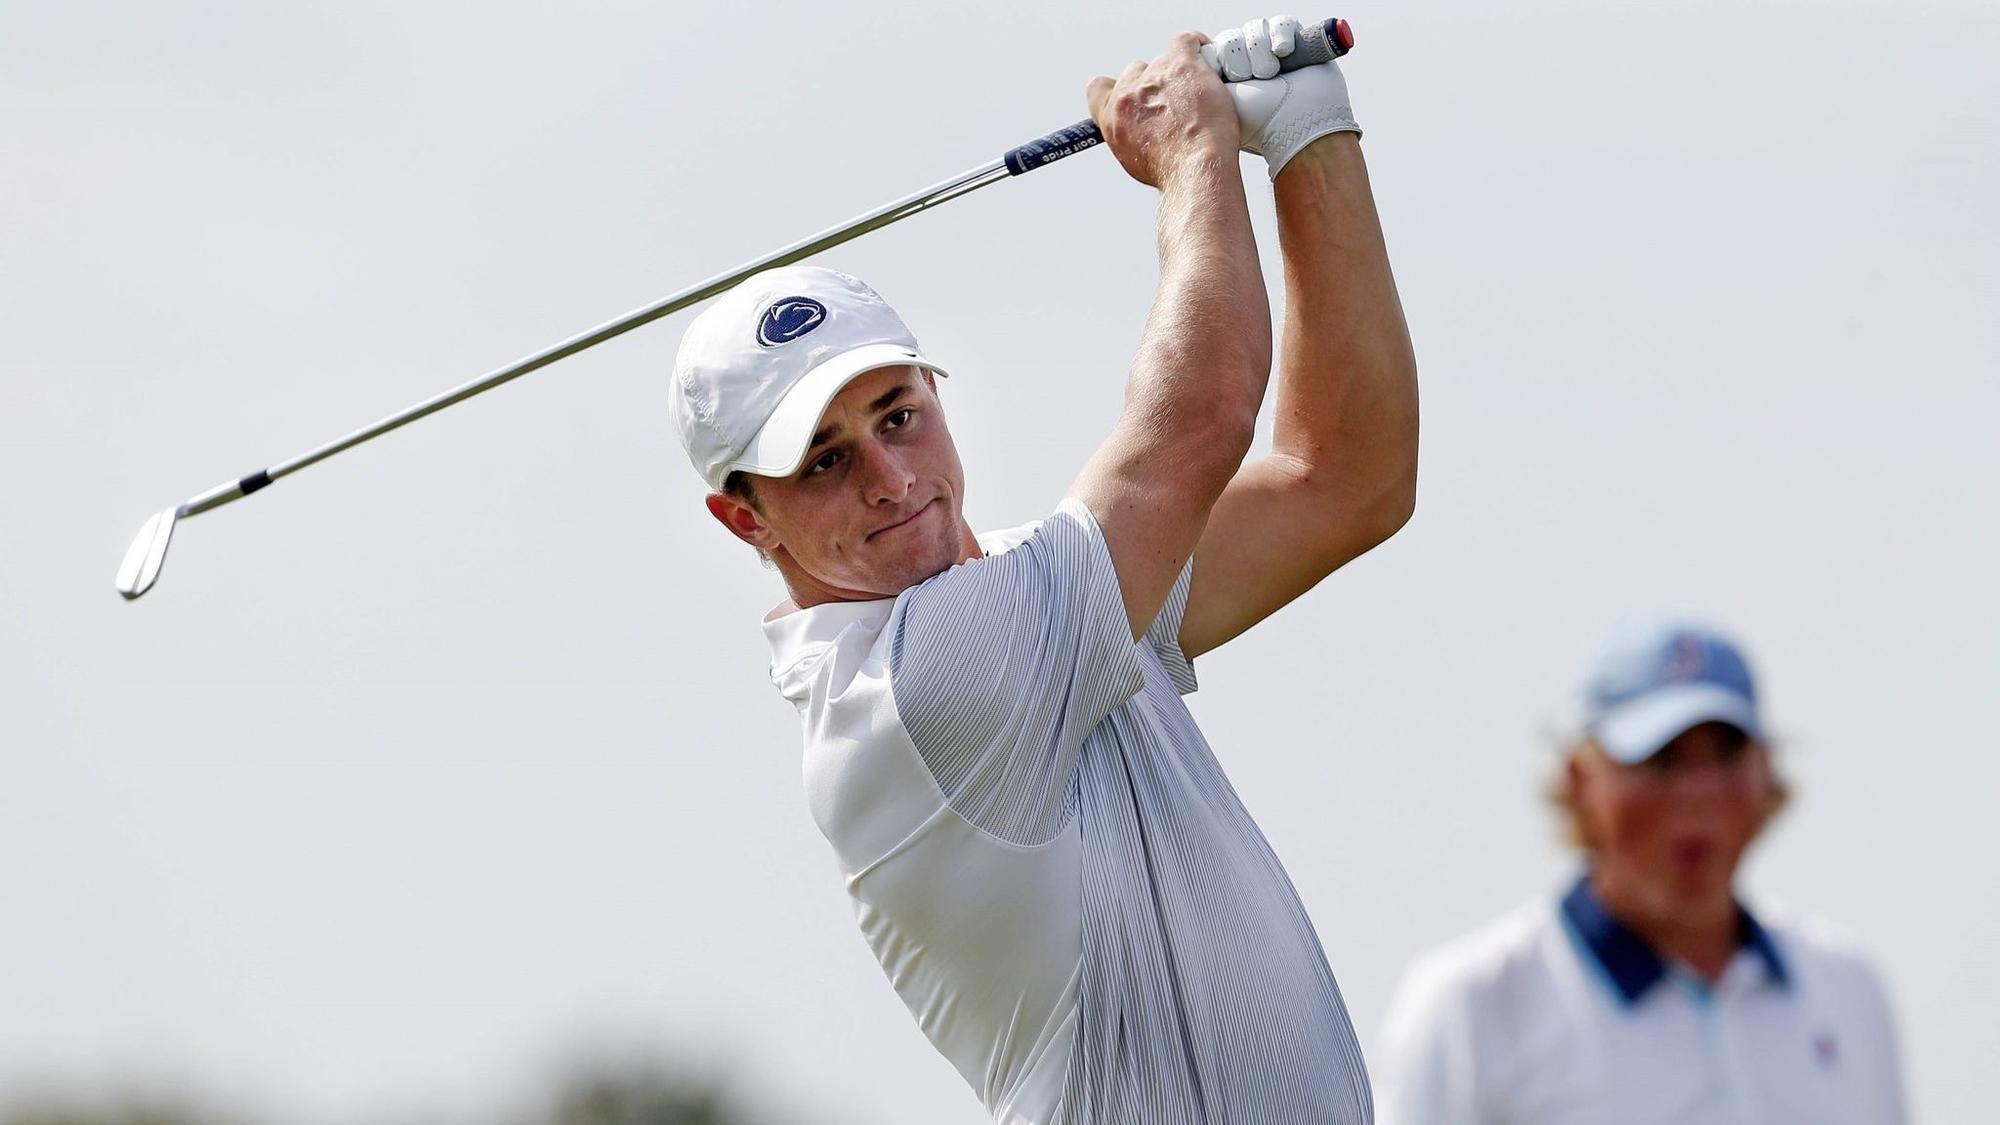 Mc-spt-cole-miller-penn-state-golf-professional-20180424